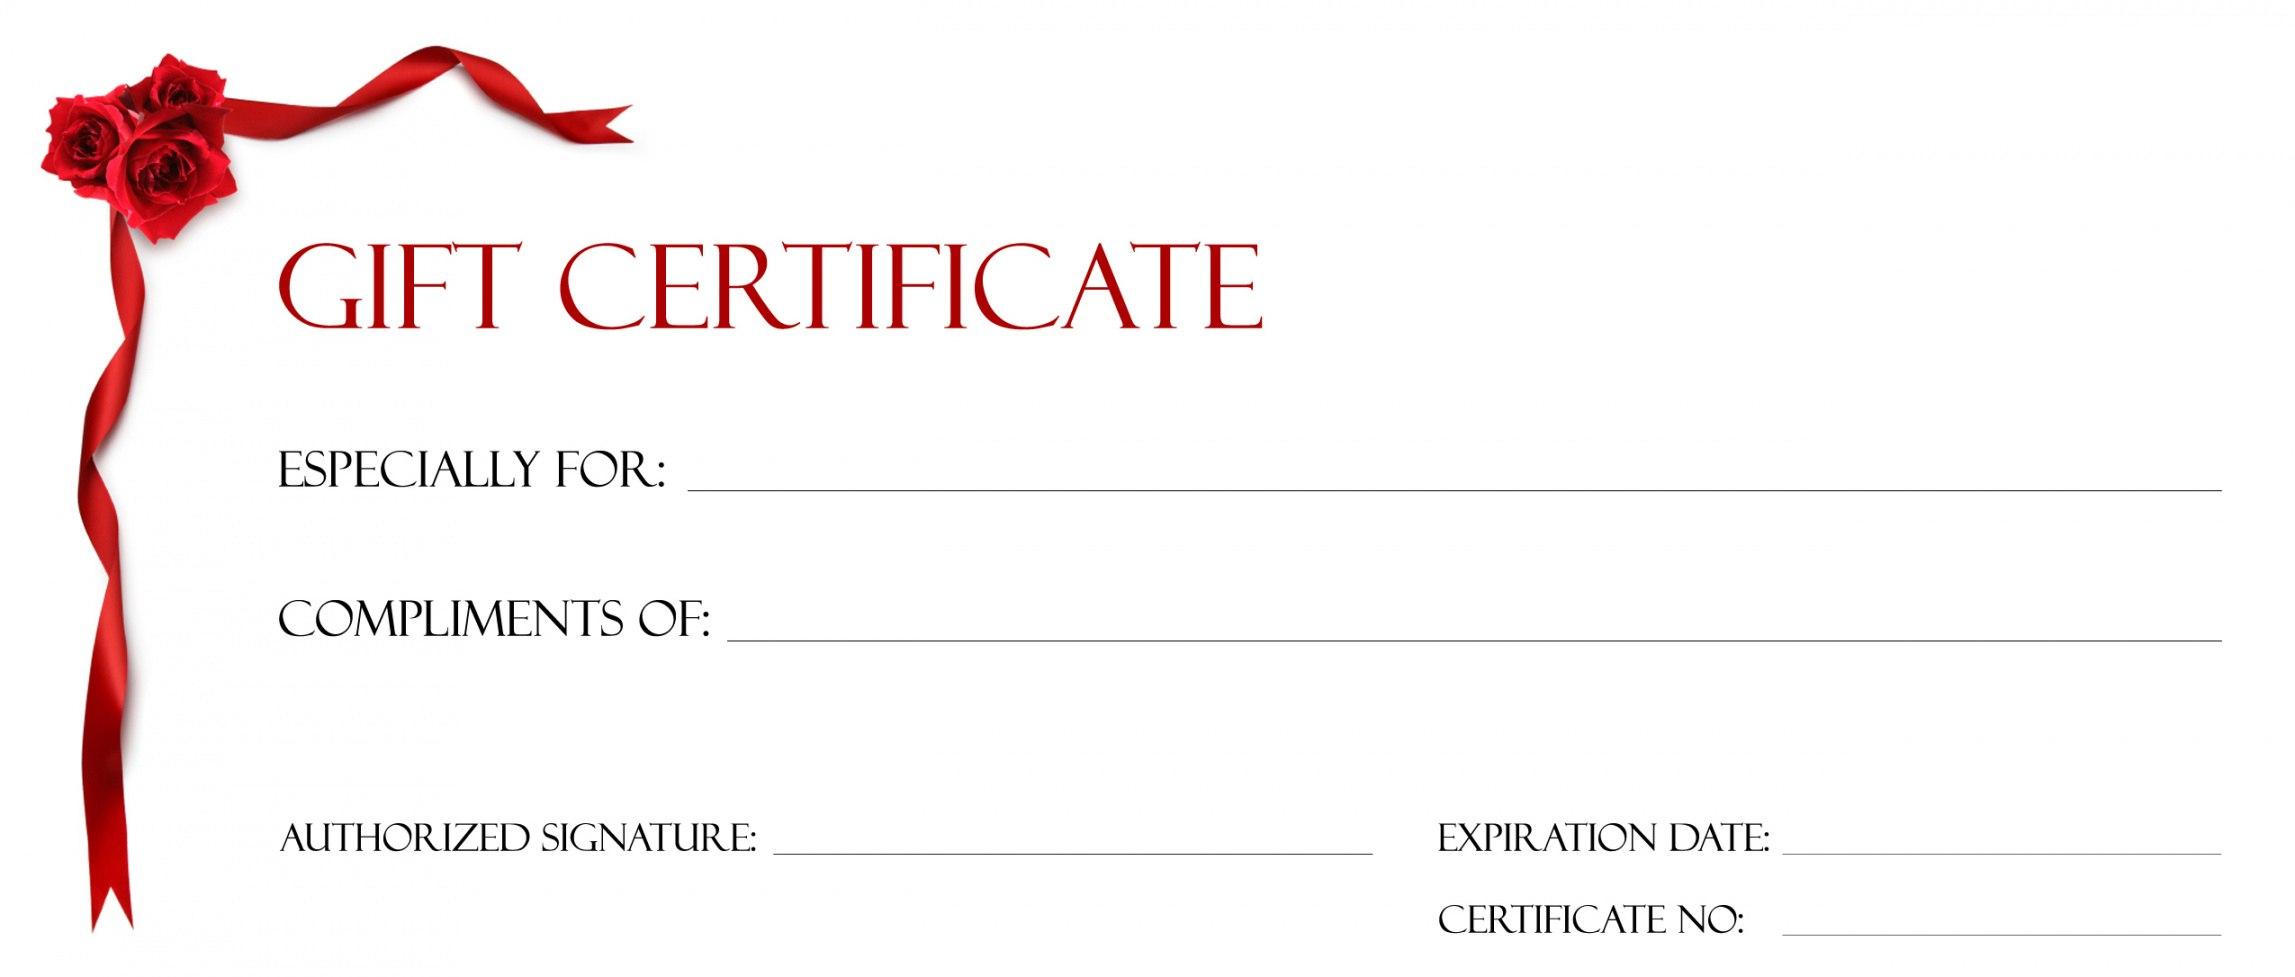 Editable Blank Tattoo Gift Certificate Template Tattoo Gift In Tattoo Gift Certificate Template